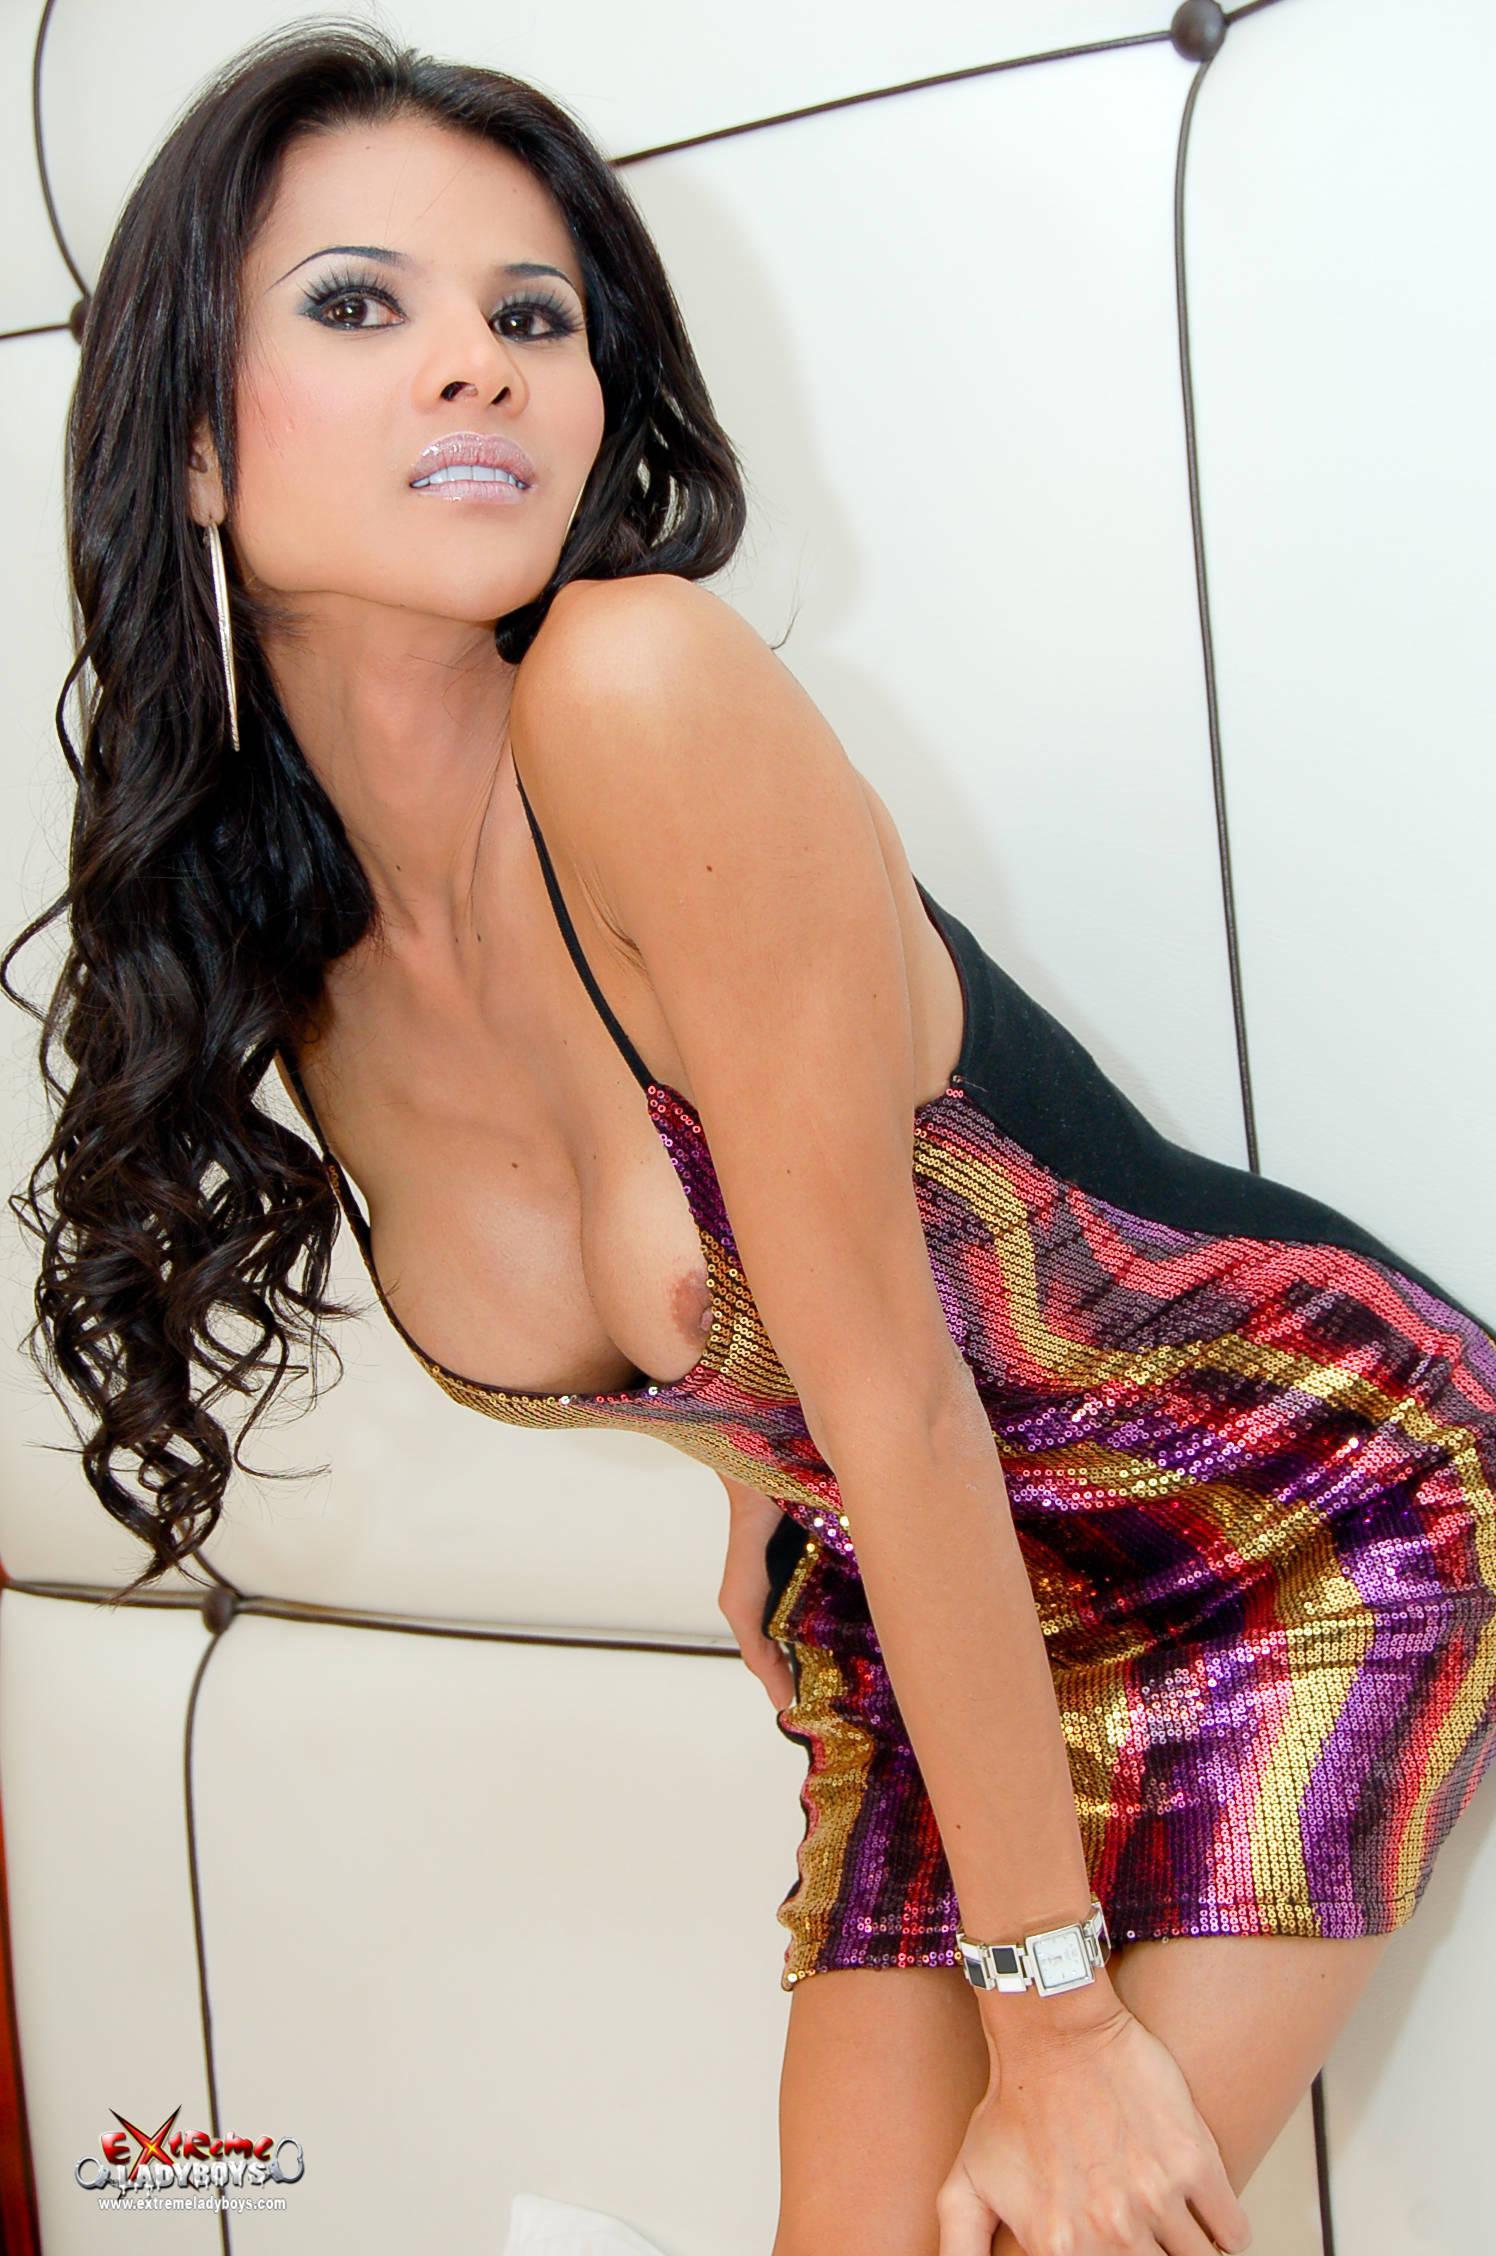 Nasty Asian Transexual Posing